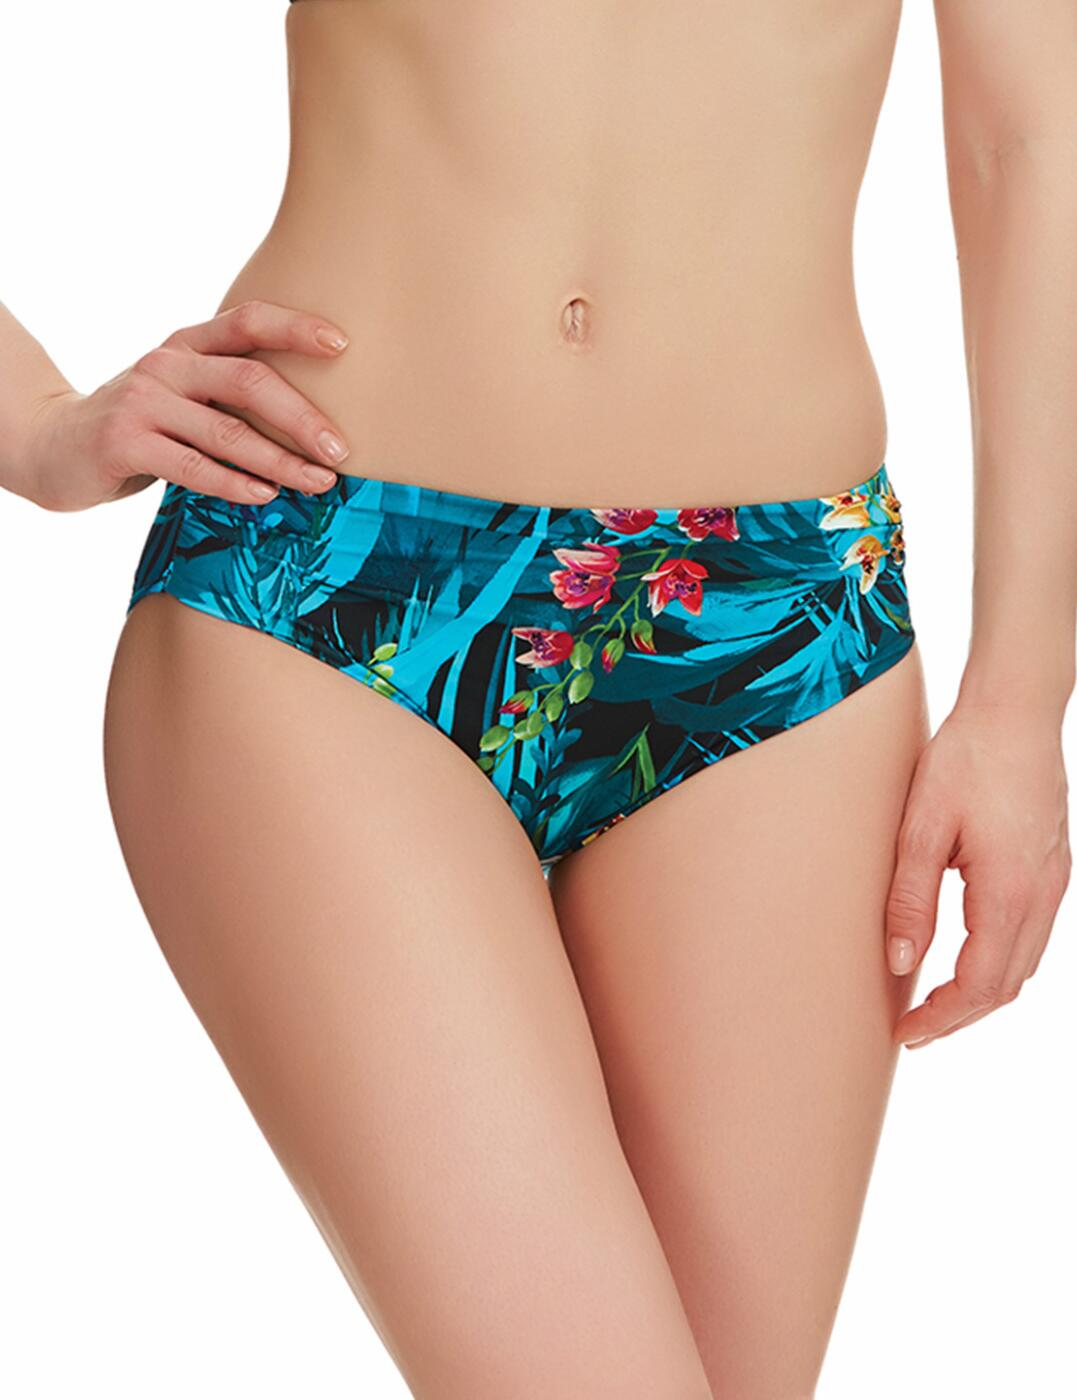 6107 Fantasie Seychelles Mid Rise Gathered Bikini Brief - 6107 Mid Rise Brief